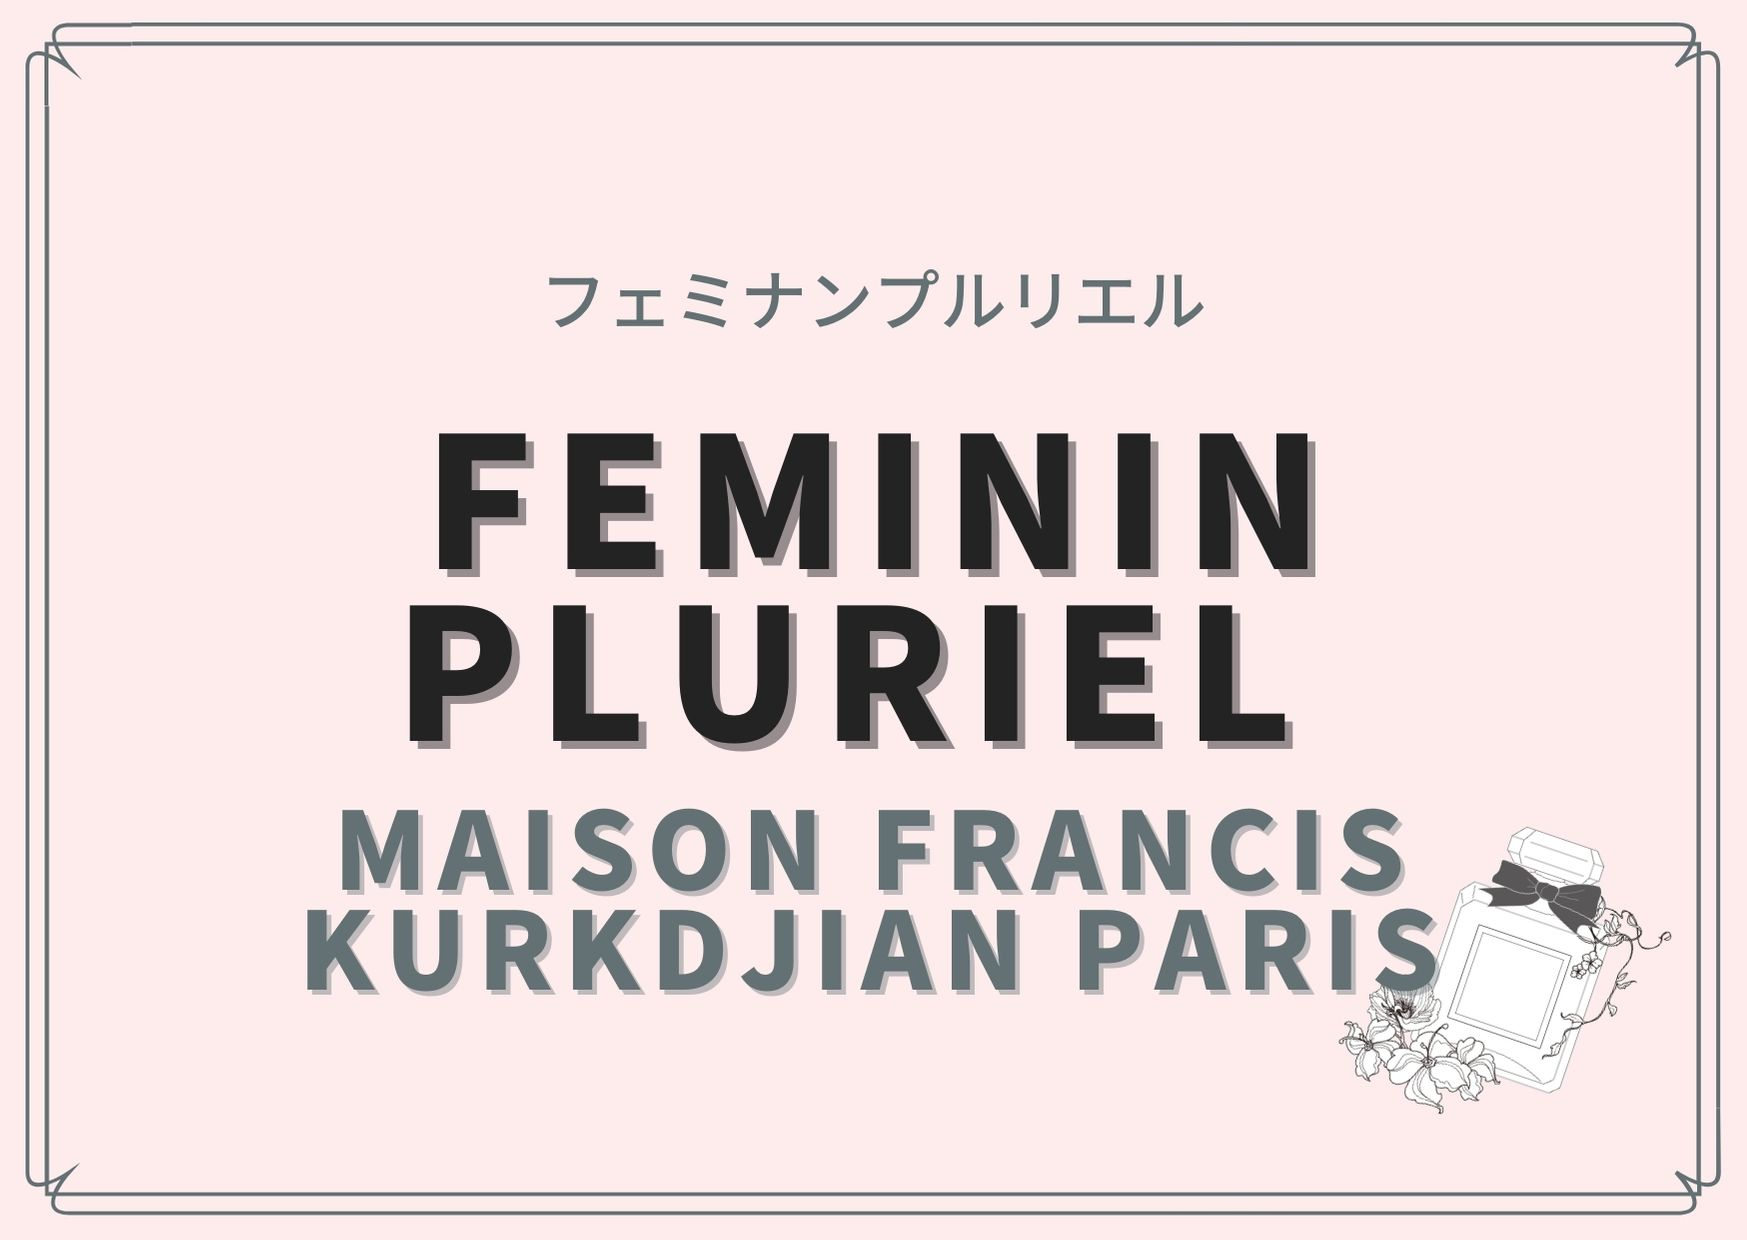 FEMININ PLURIEL (フェミナンプルリエル) / Maison Francis Kurkdjian Paris(メゾン フランシス クルジャン)